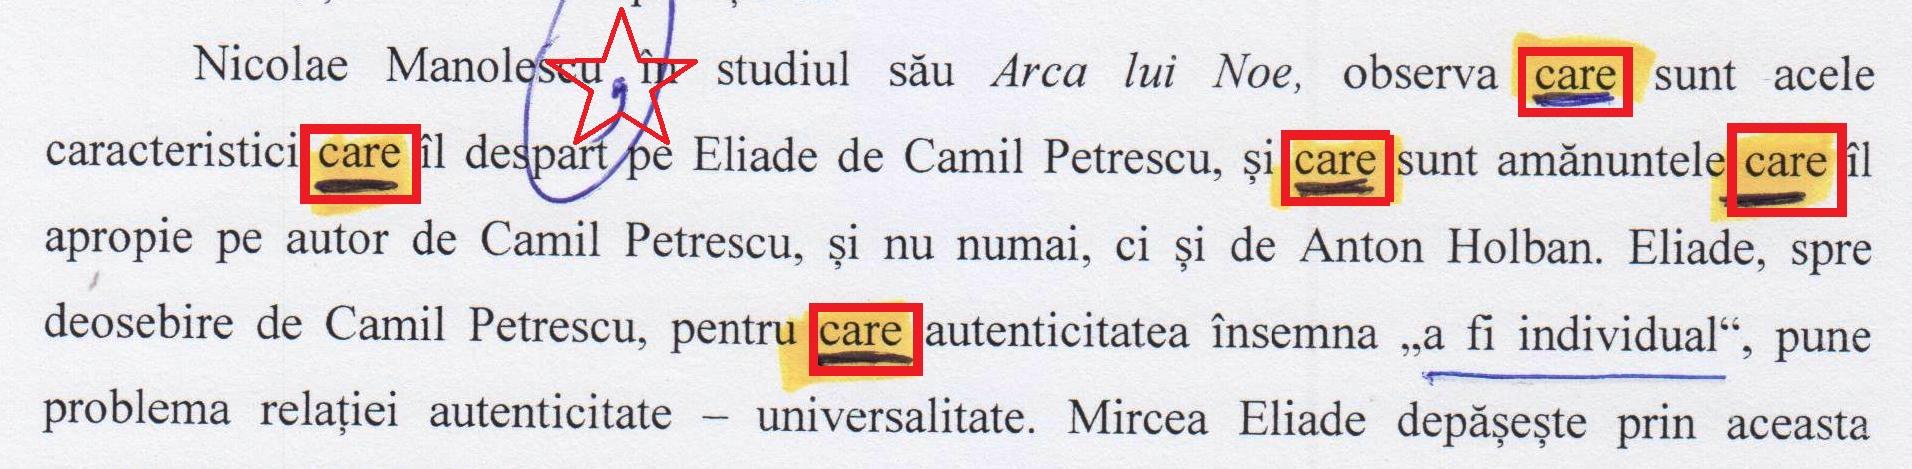 Care!... Care!... Care!... Care!... Care!...